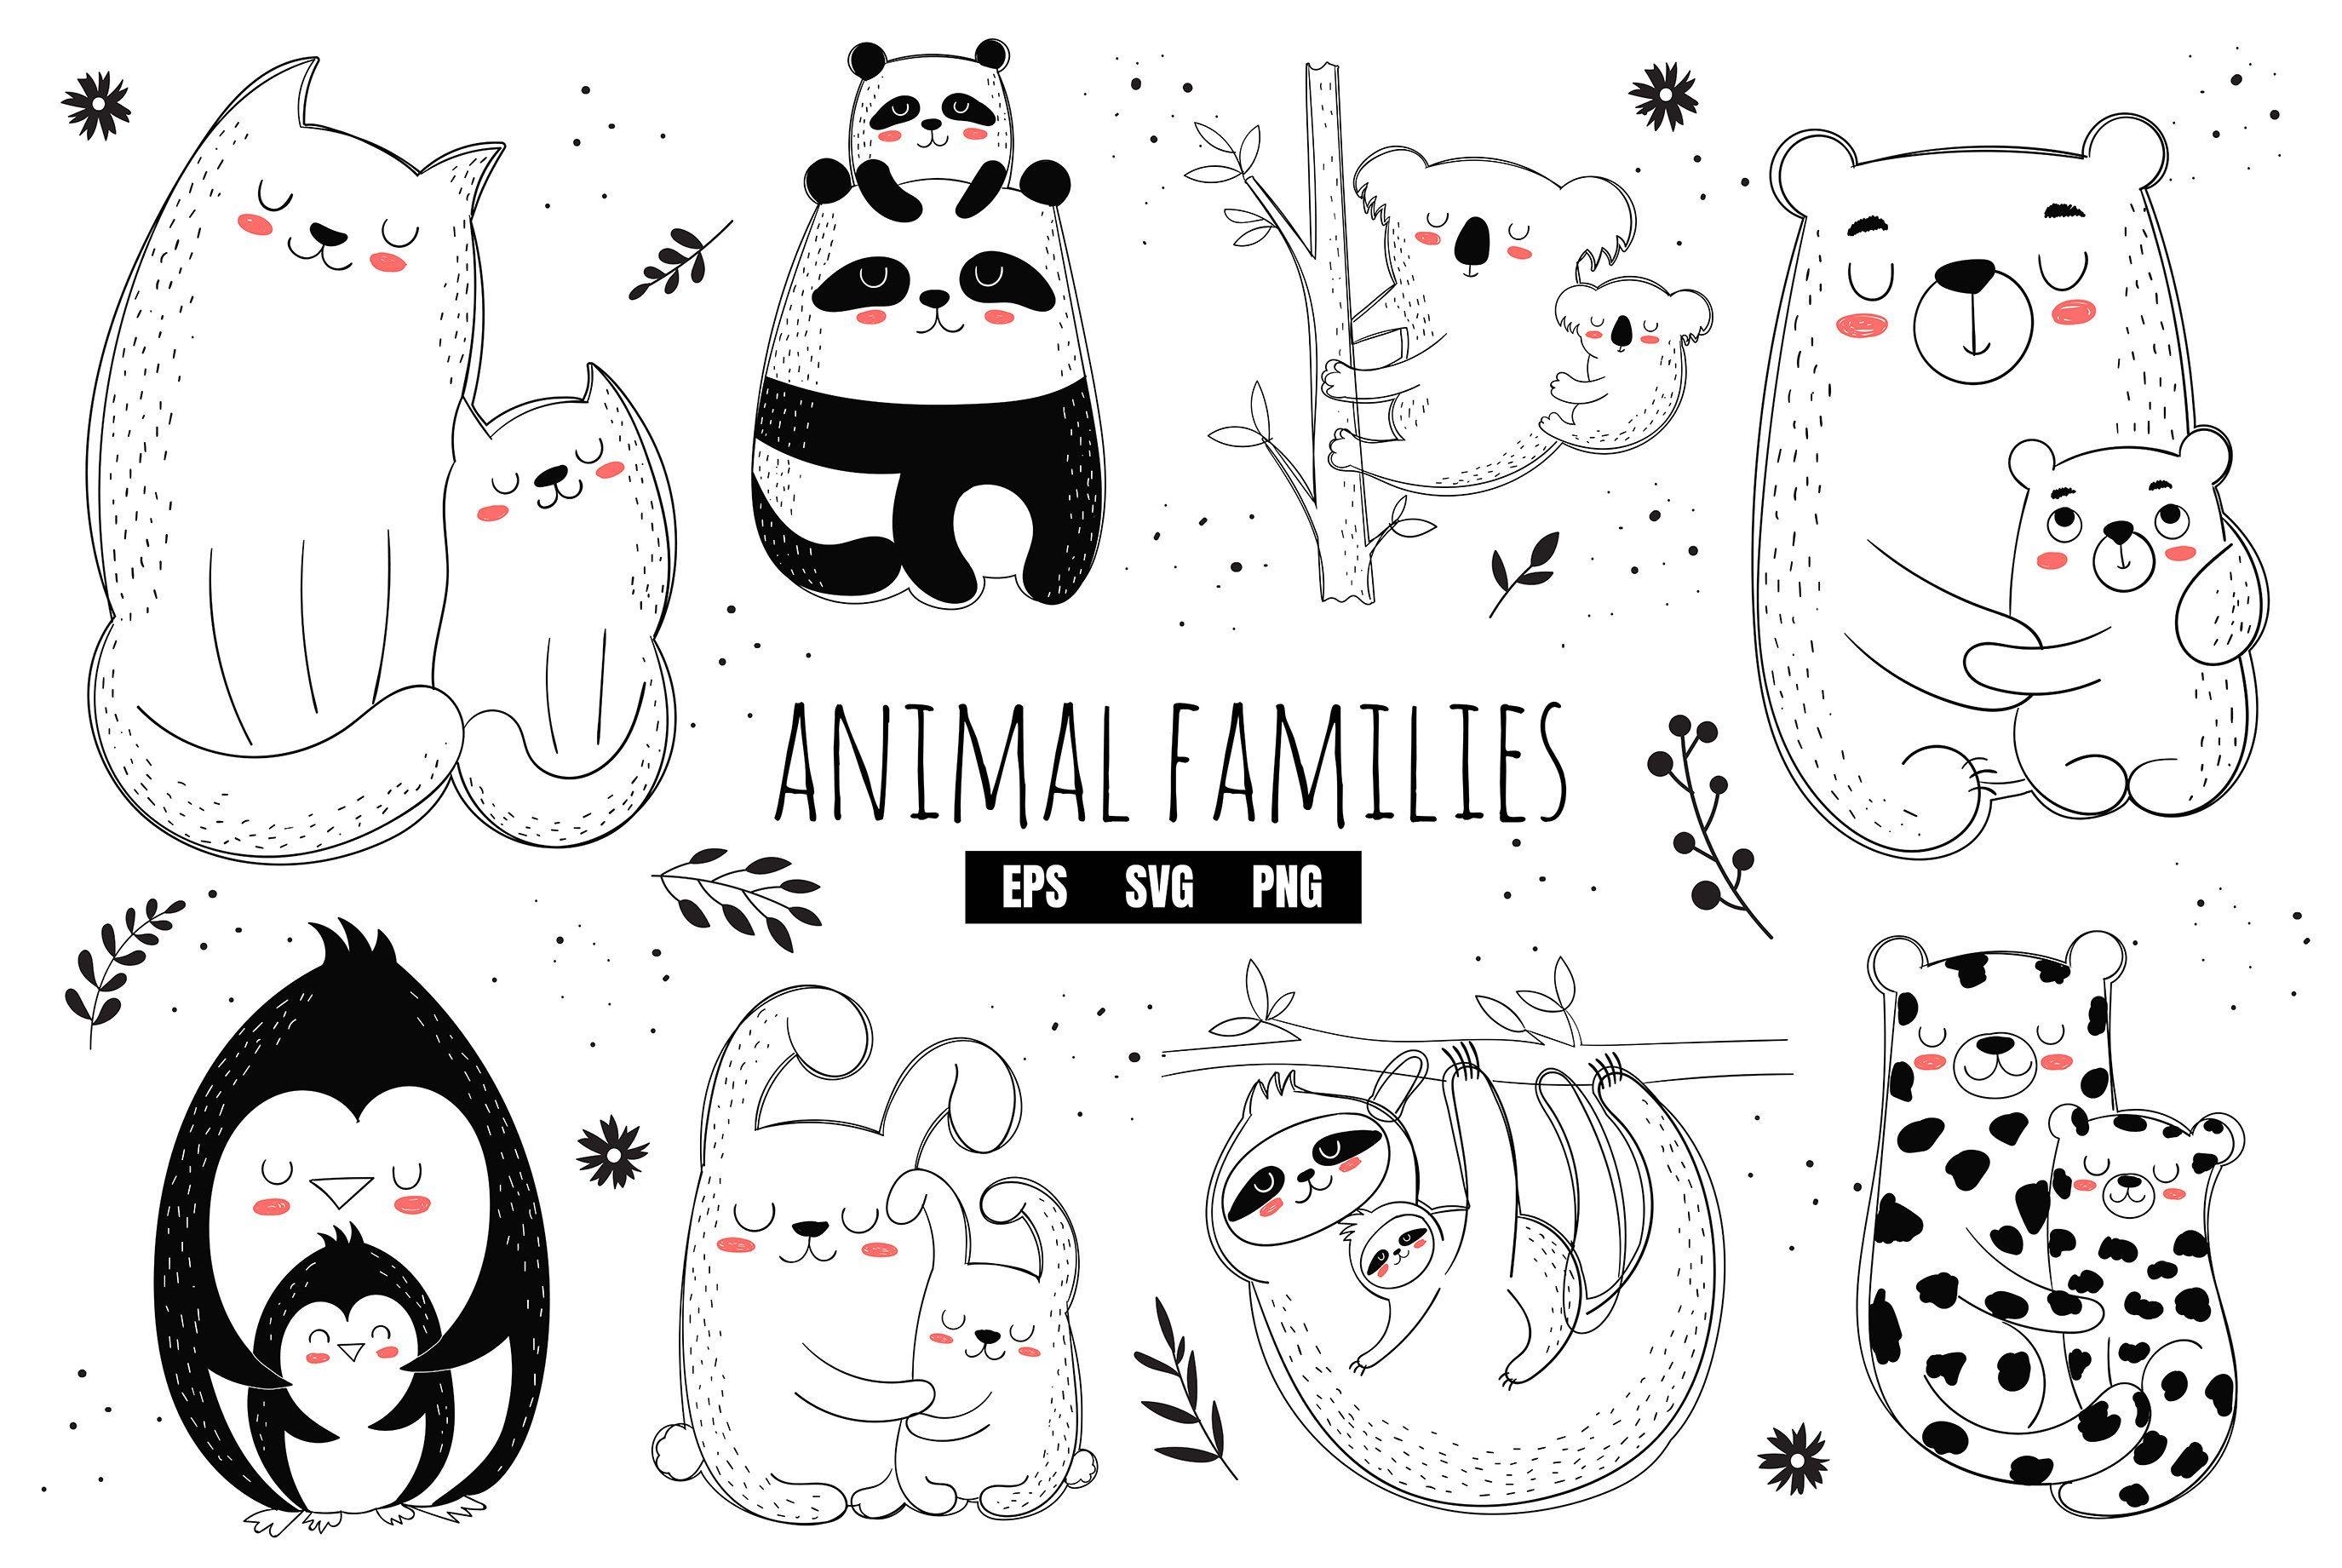 Mothers Day Svg Mother S Day Clipart Animal Mothers Bear Etsy Clipart Decoraciones De Guarderia Tarjetas Del Dia De Las Madres